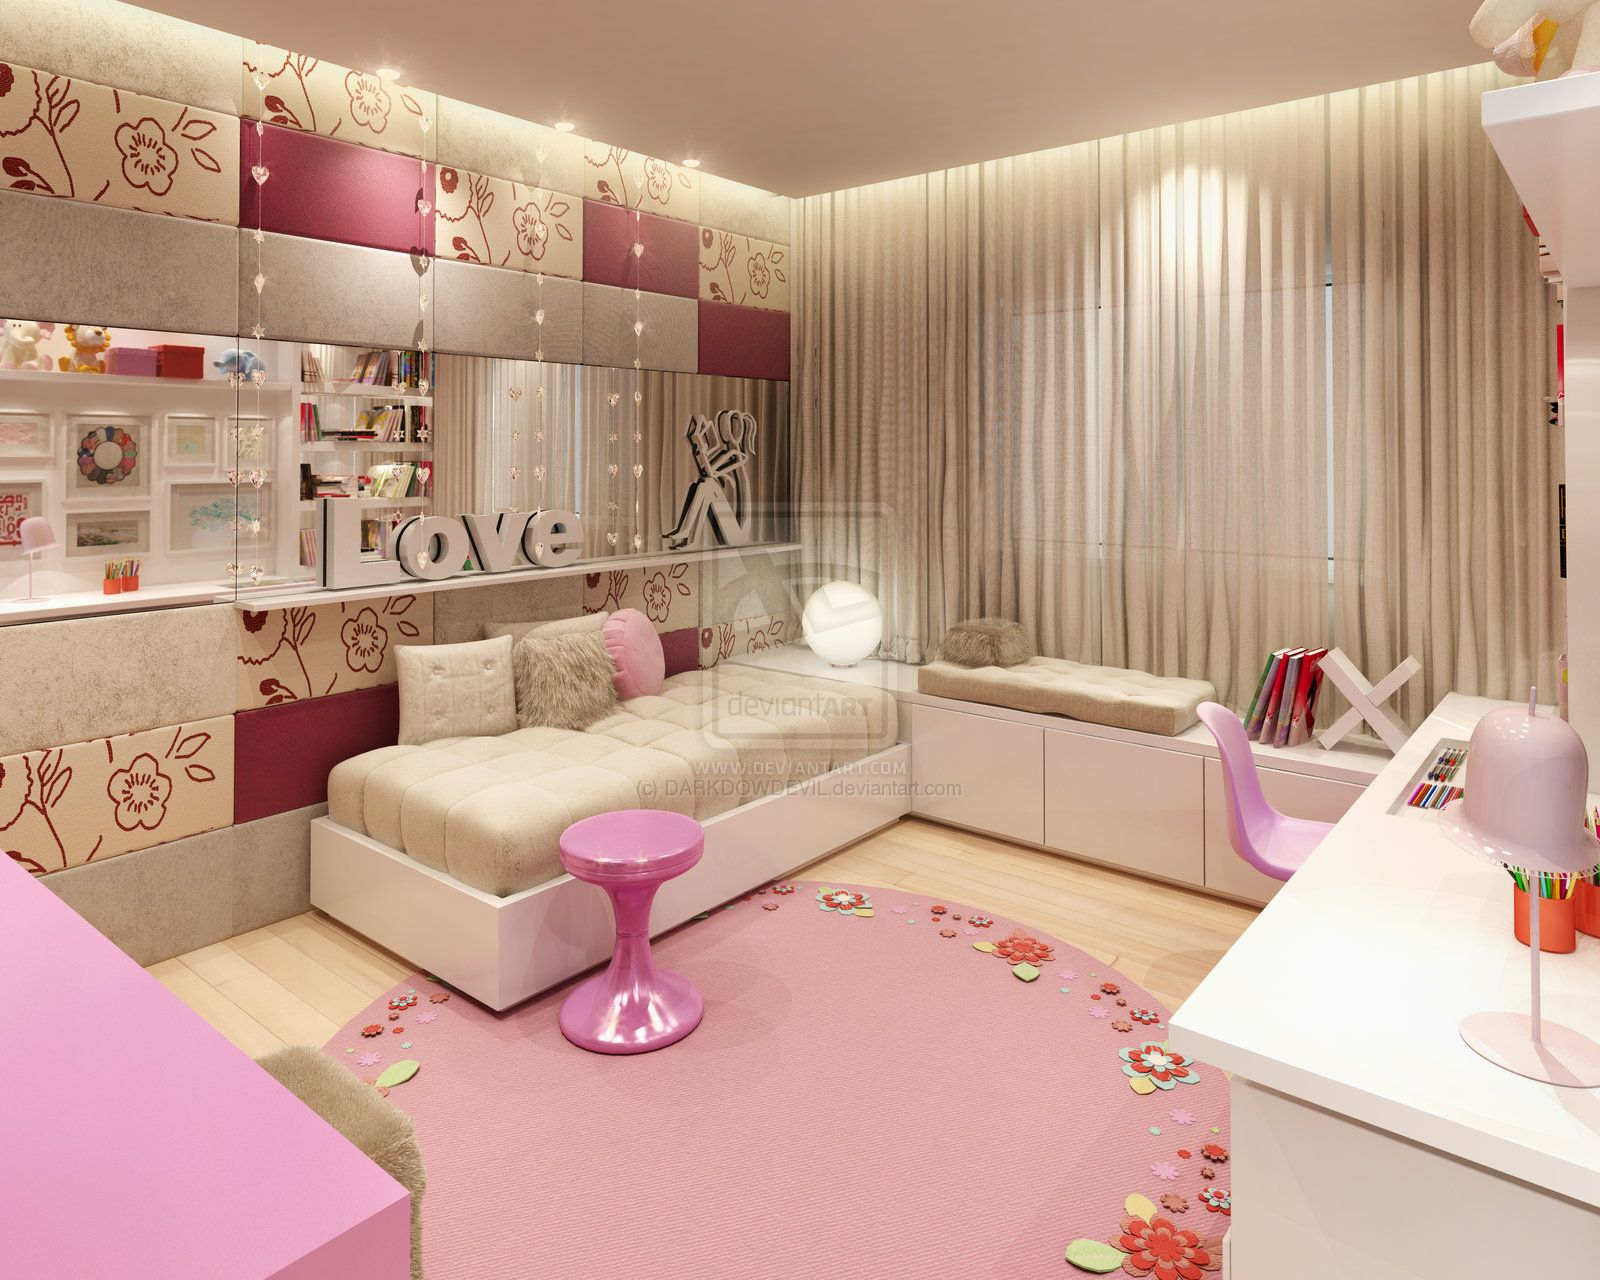 Easy Bedroom Ideas 2 New in House Designerraleigh kitchen